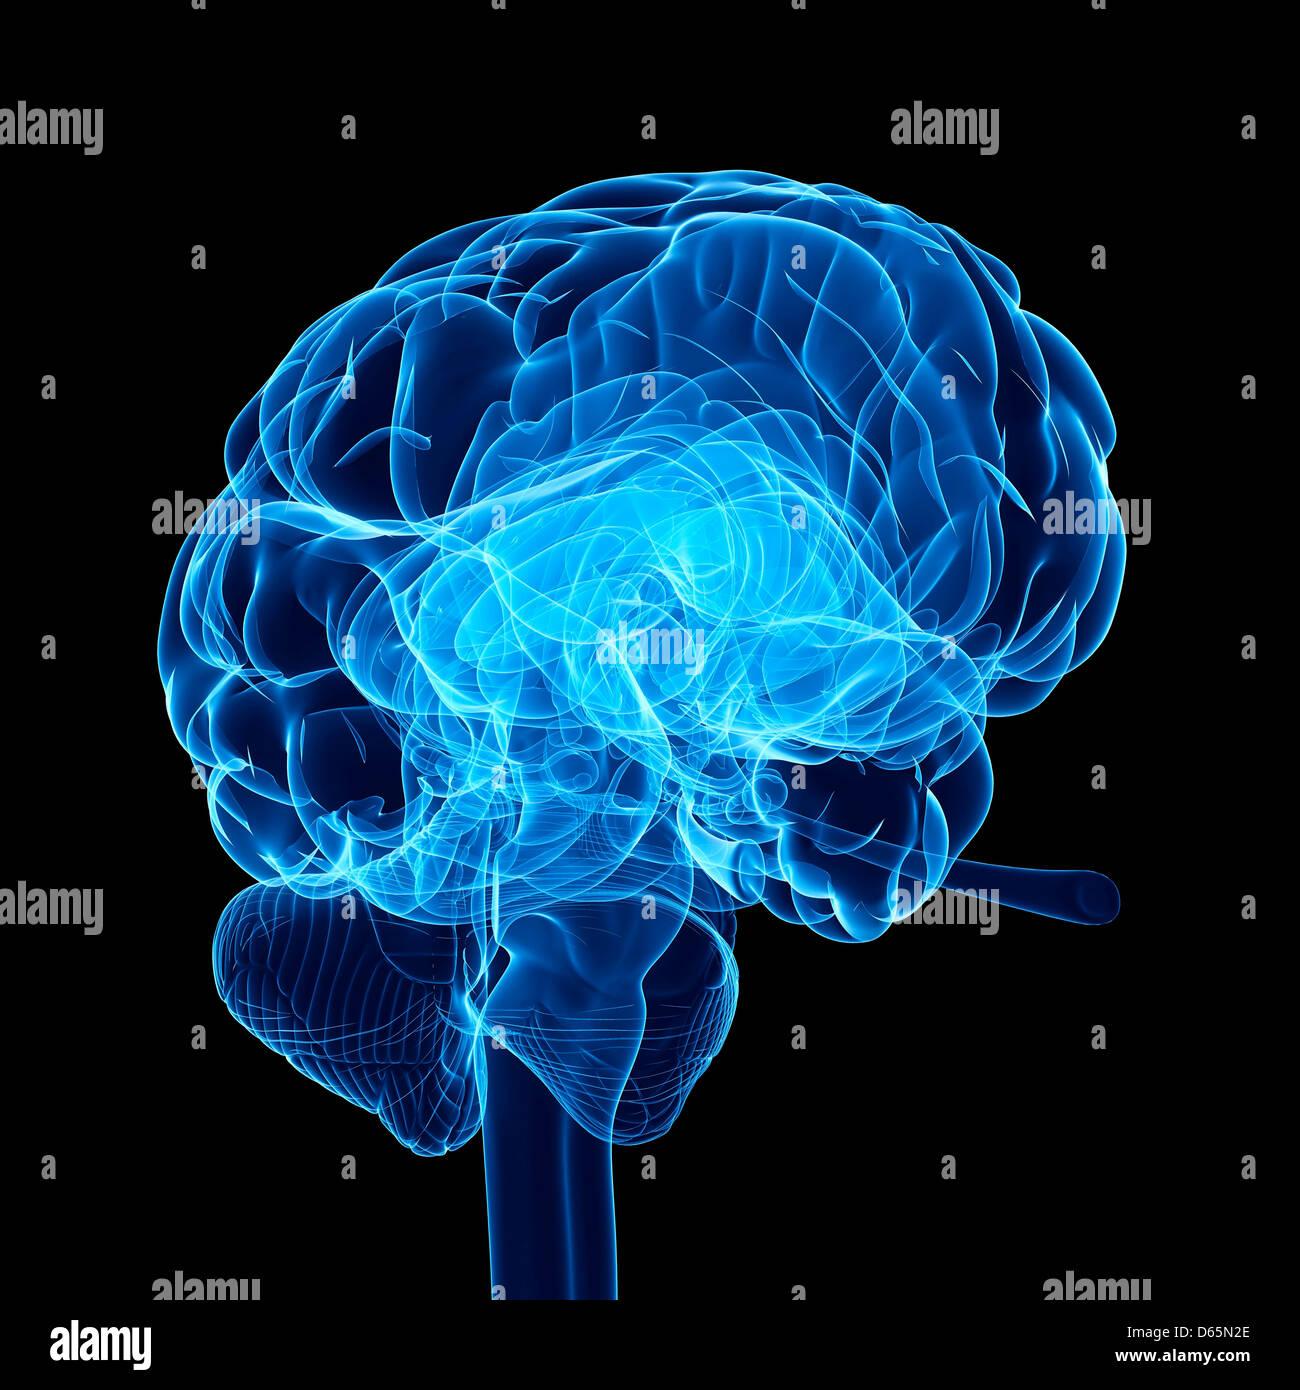 Human brain, artwork - Stock Image